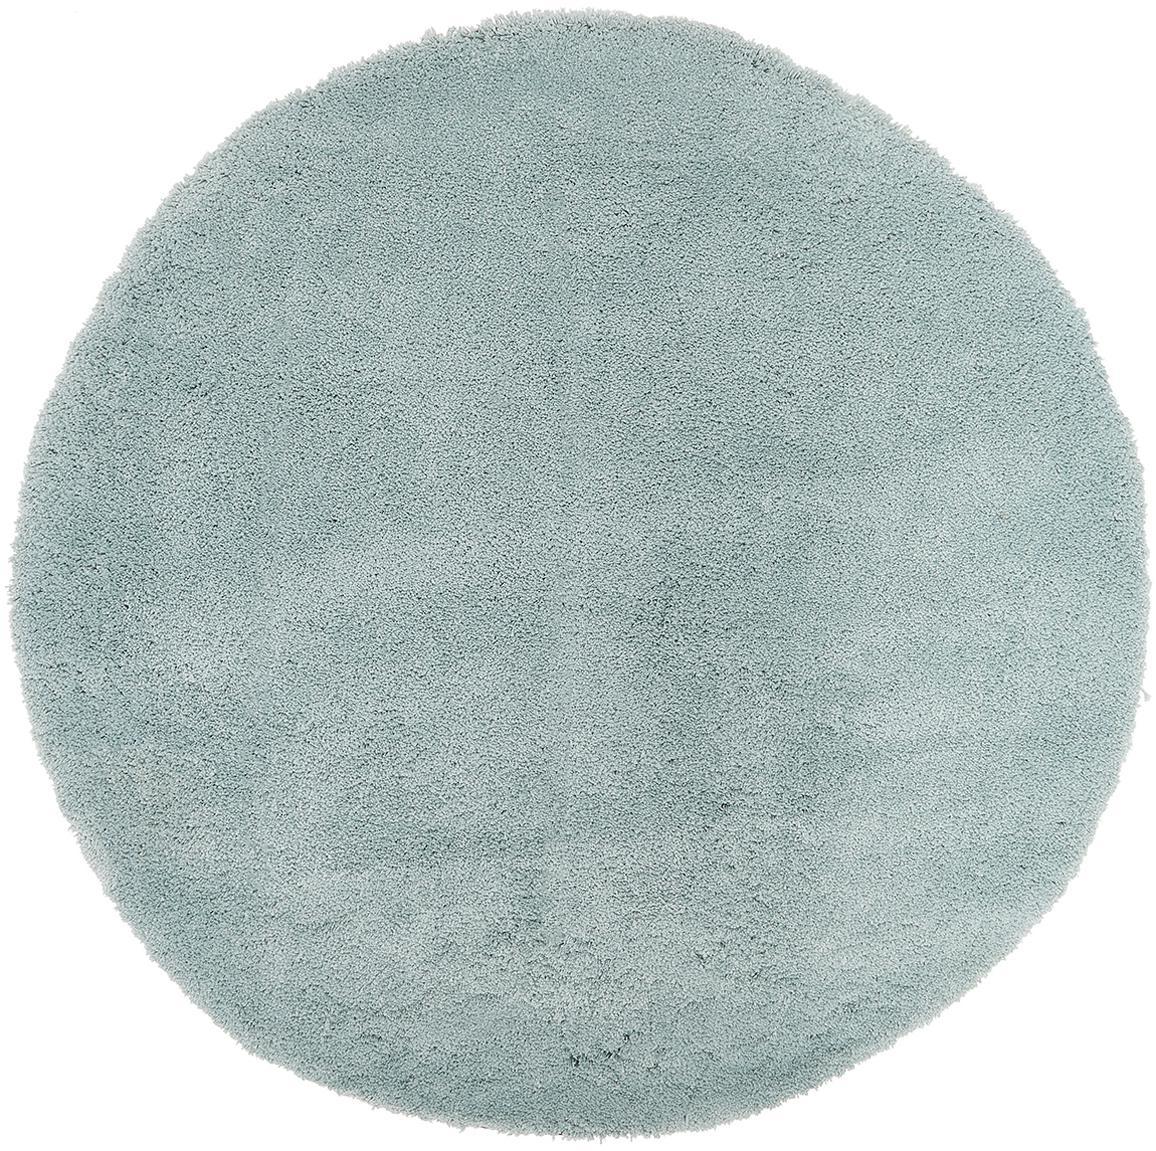 Flauschiger runder Hochflor-Teppich Leighton in Mintgrün, Flor: 100% Polyester (Mikrofase, Mintgrün, Ø 120 cm (Grösse S)